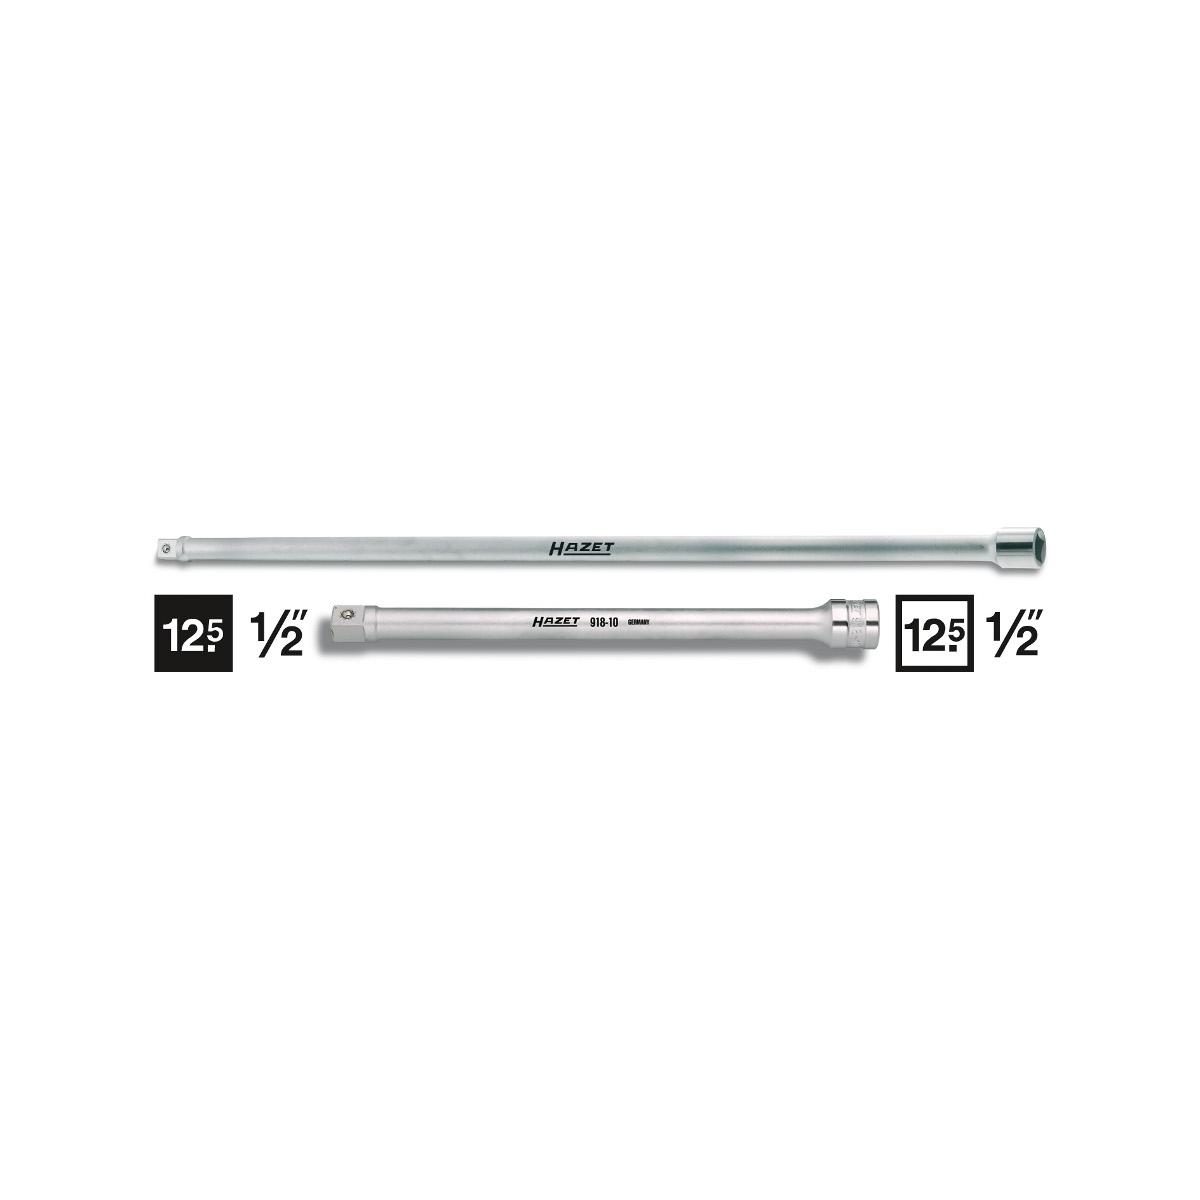 HAZET Extension 918, 248.0 - 575.0 mm